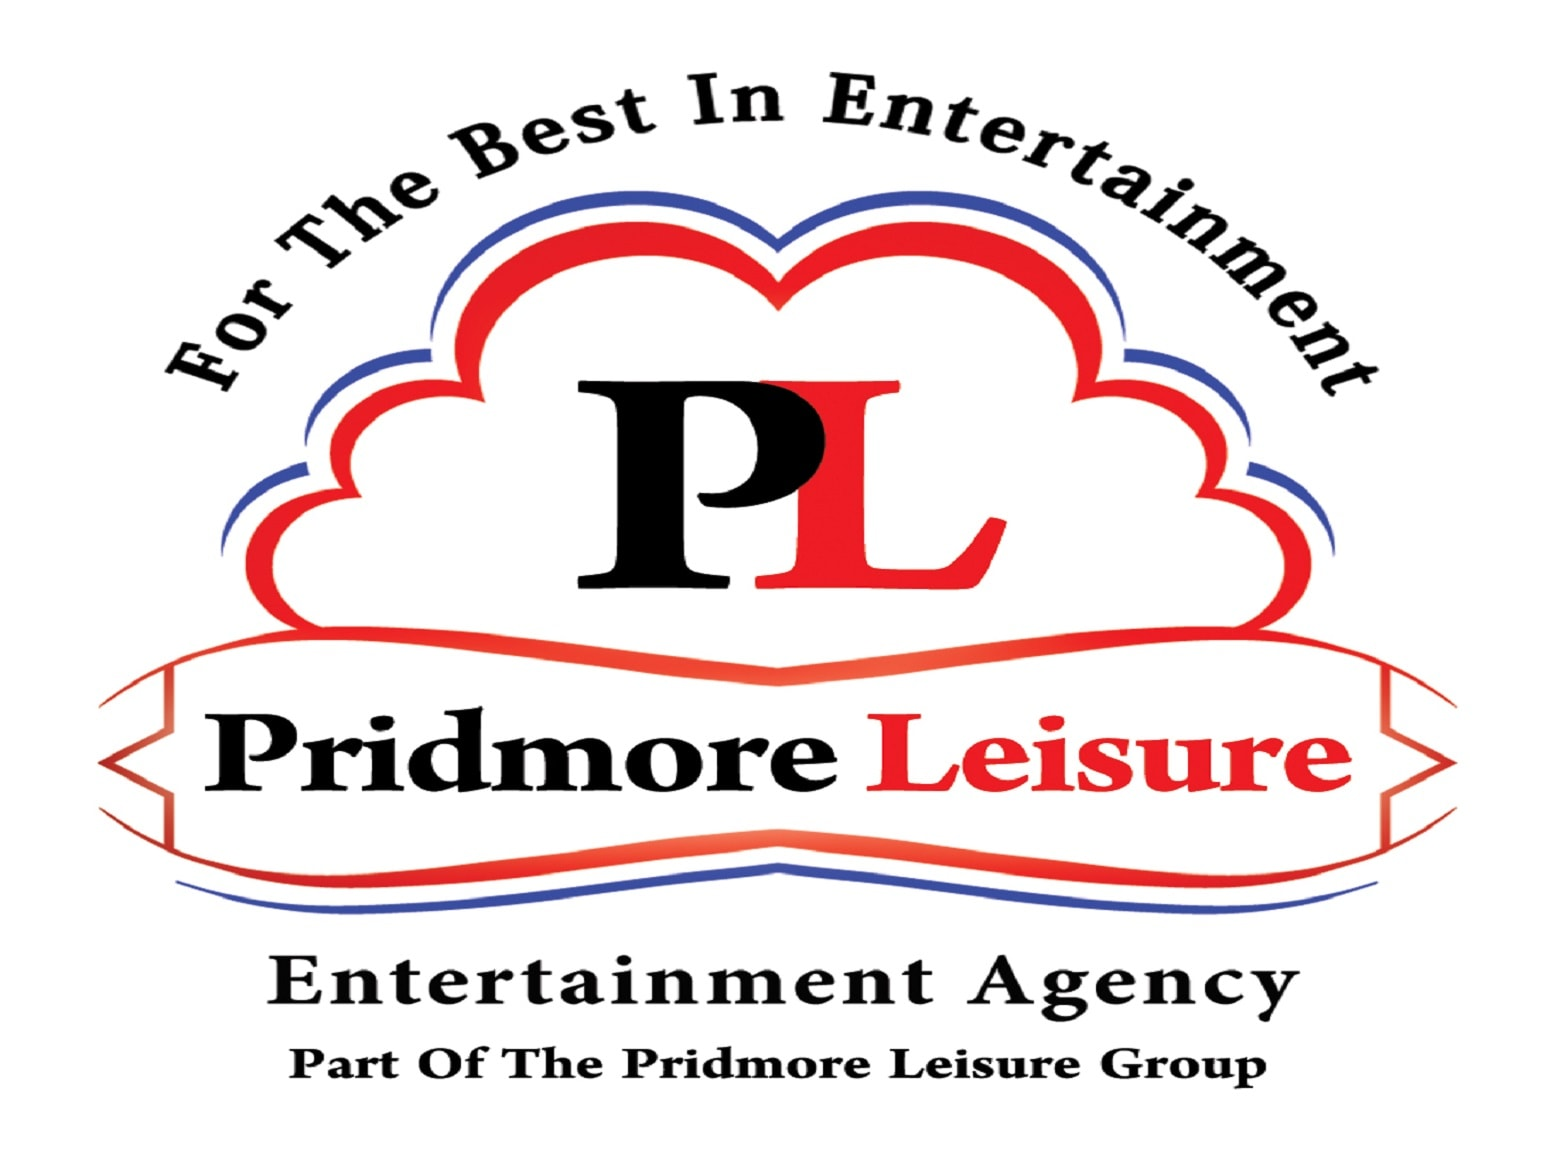 Pridmore Leisure Entertainment Agency